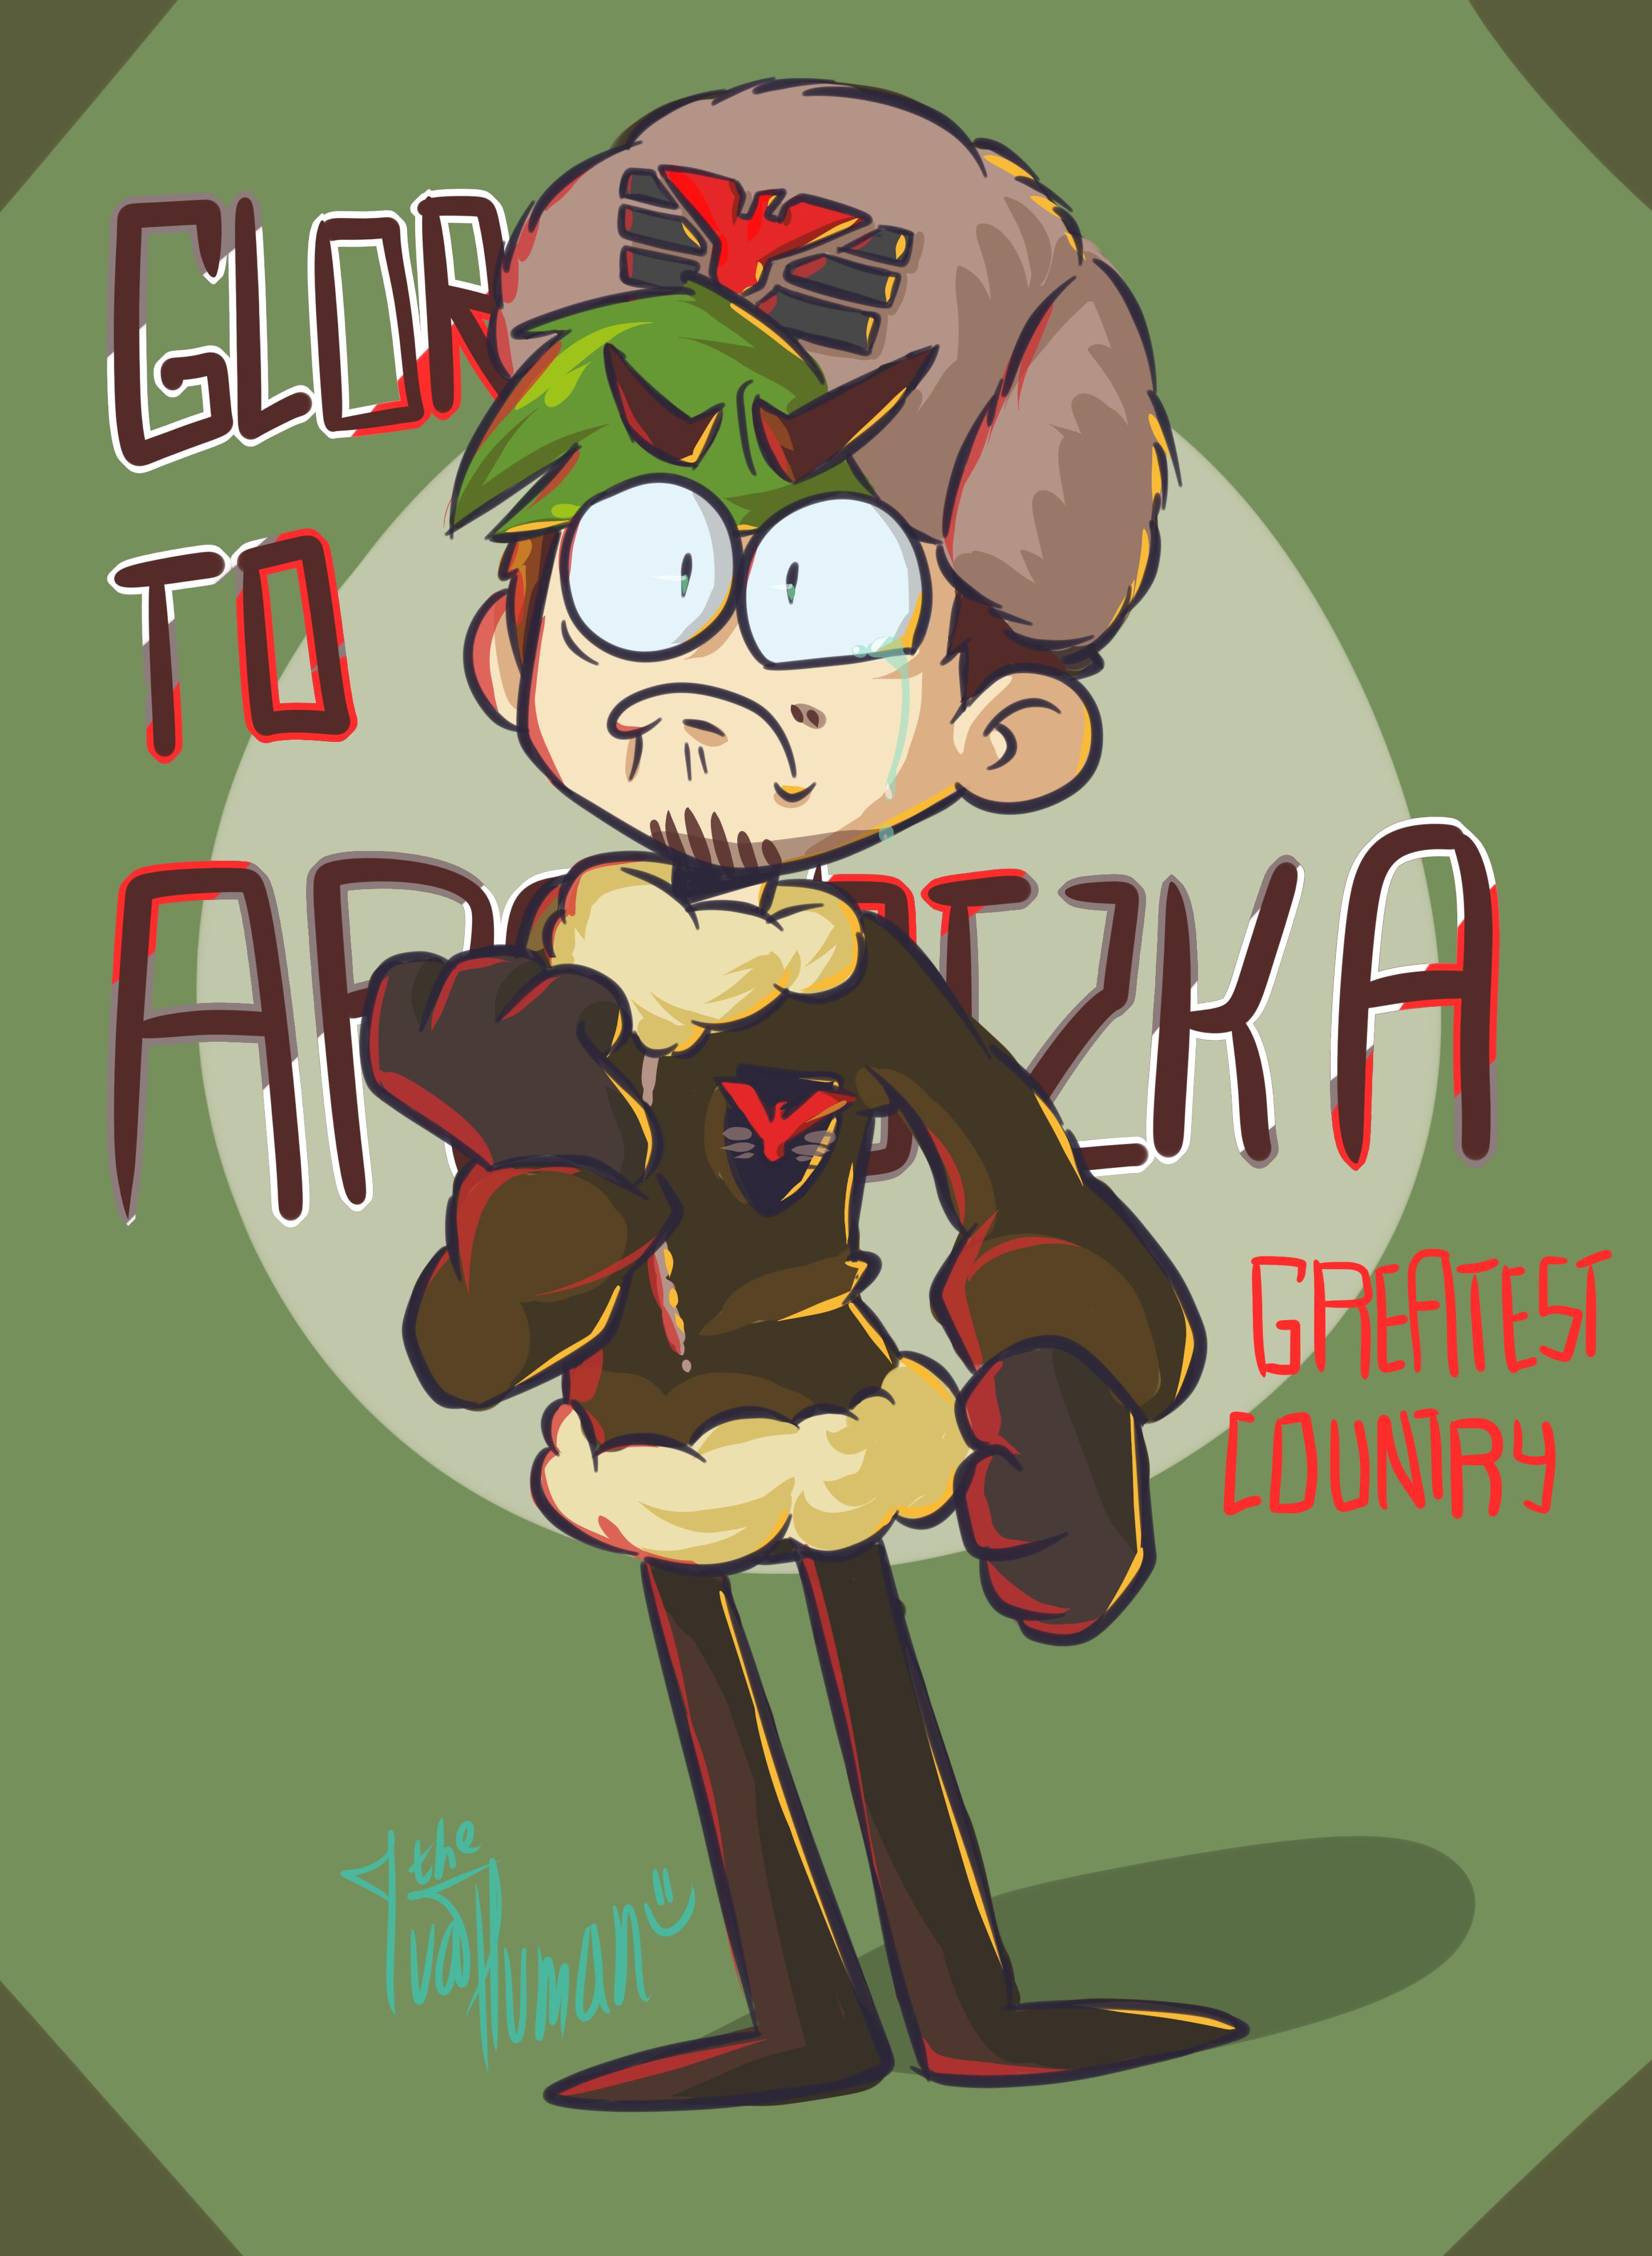 Glory to Arstotzka! by IvaTheHuman on DeviantArt